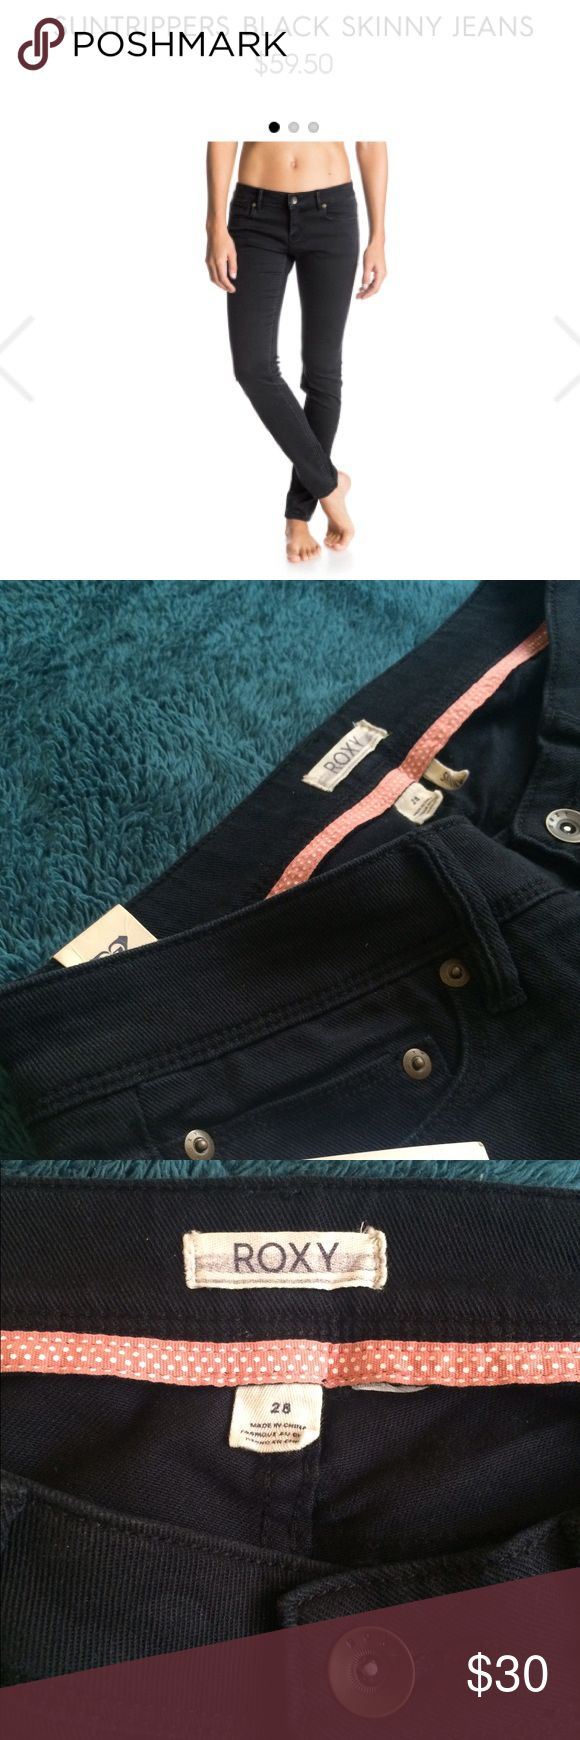 ROXY SUNSTRIPPERS SKINNY BLACK JEANS Size 28   Skinny Jeans Lightweight 270g /9.5 oz. material High waist Indigo overdye ROXY leather patch clamped on the back pocket Roxy Jeans Skinny